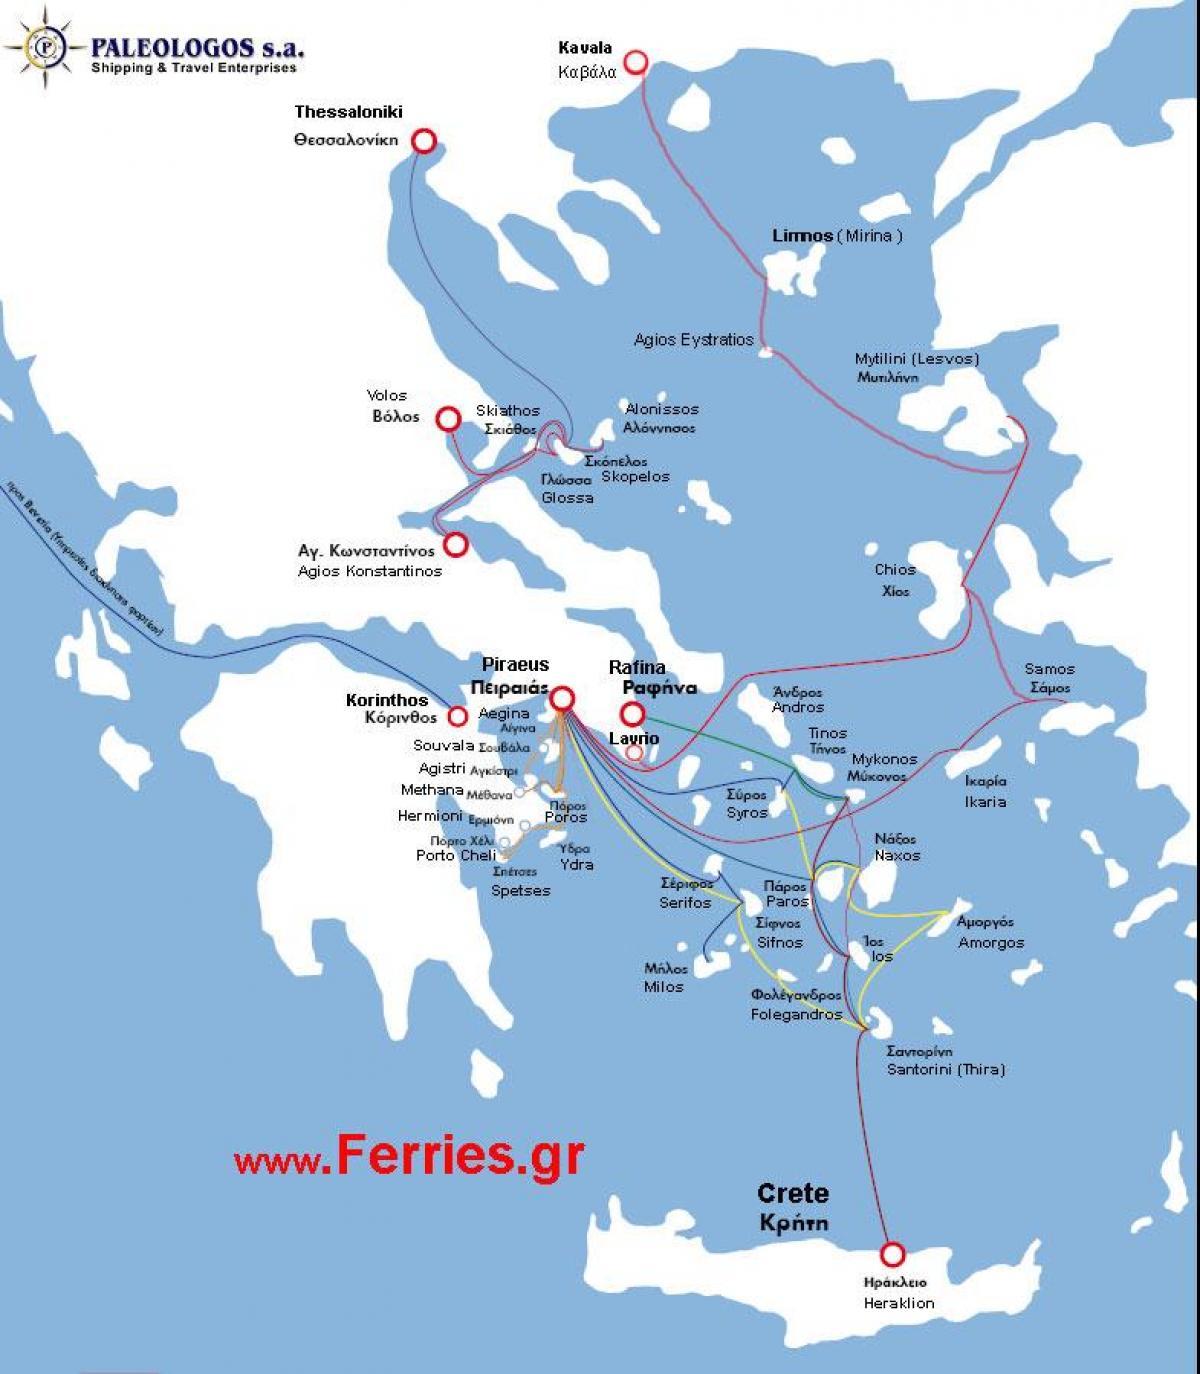 Favoritos Ilha grega de ferry mapa de rotas - Mapa de ilhas gregas rotas de  MB38